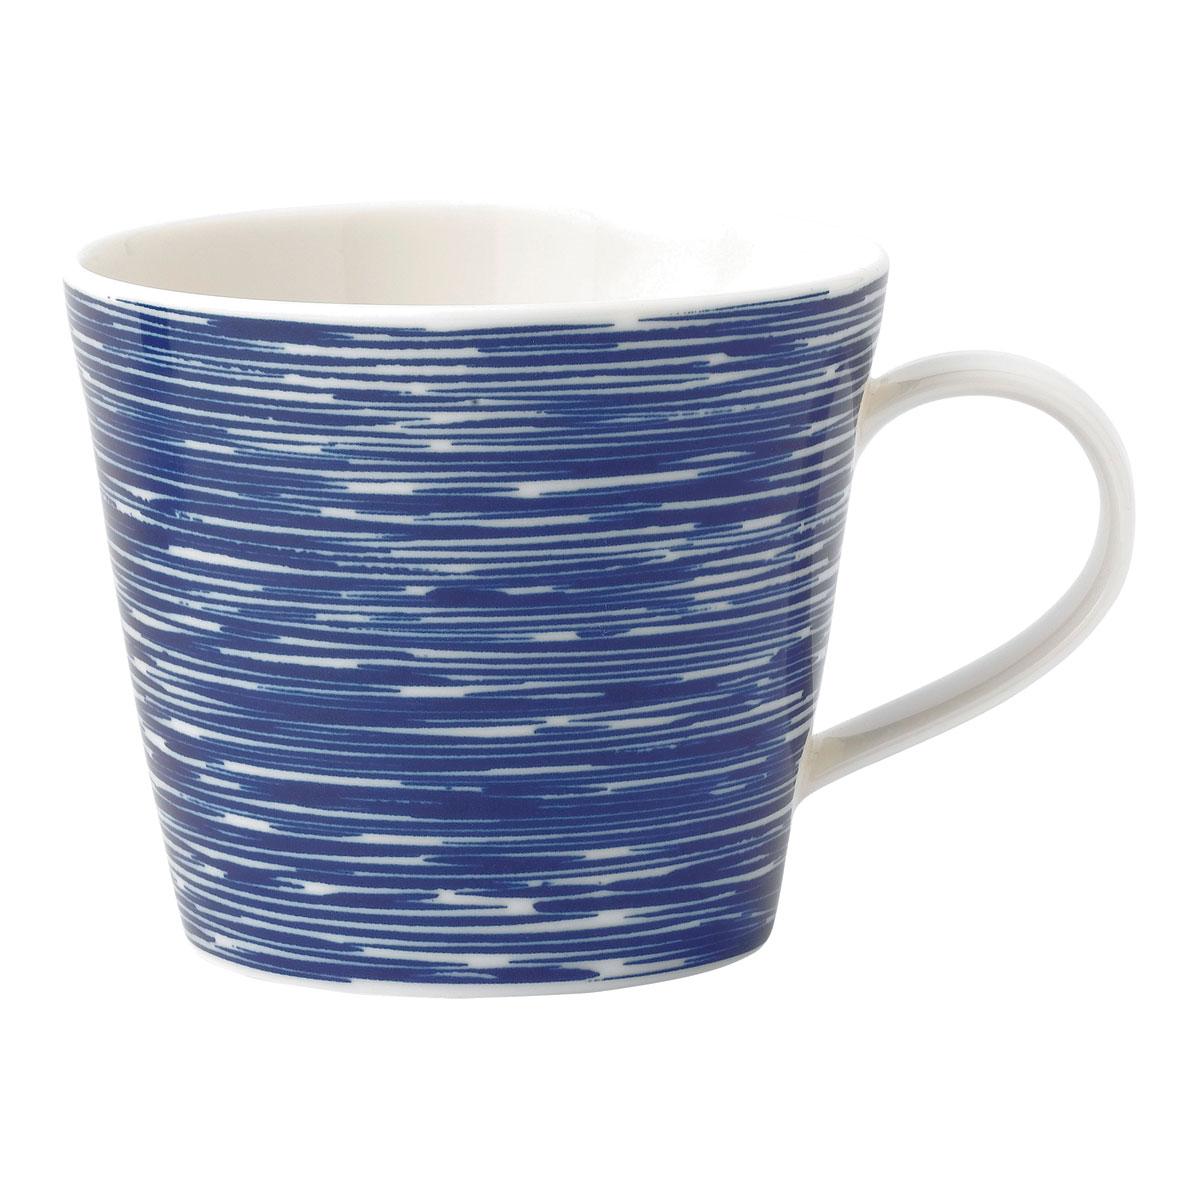 Royal Doulton Pacific Mug Texture, Single